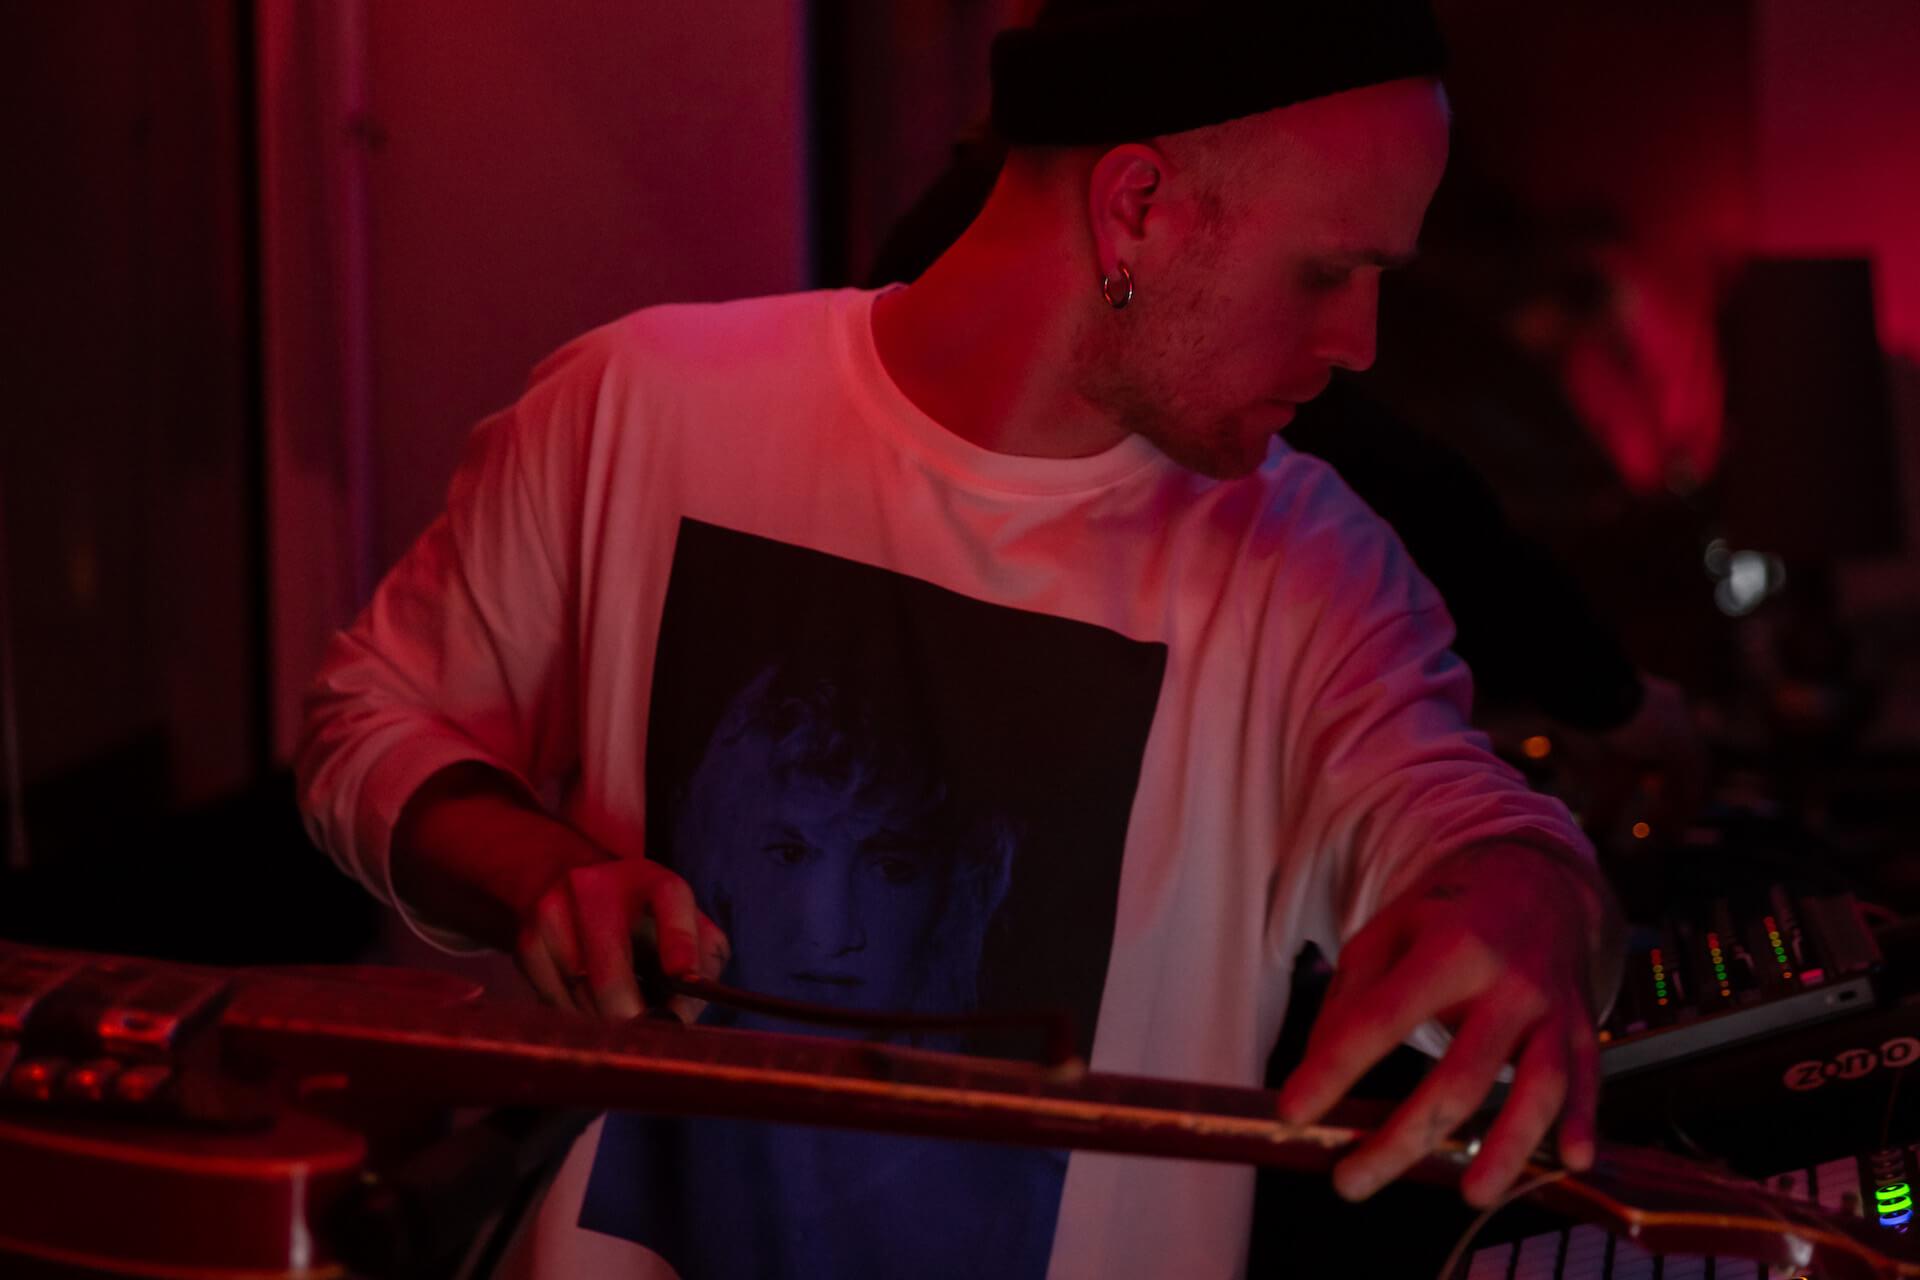 Igor KirilenkoによるソロプロジェクトHidden Elementが3部作最終章となる『Cycles』をリリース! music210507_hidden-element-210507_3